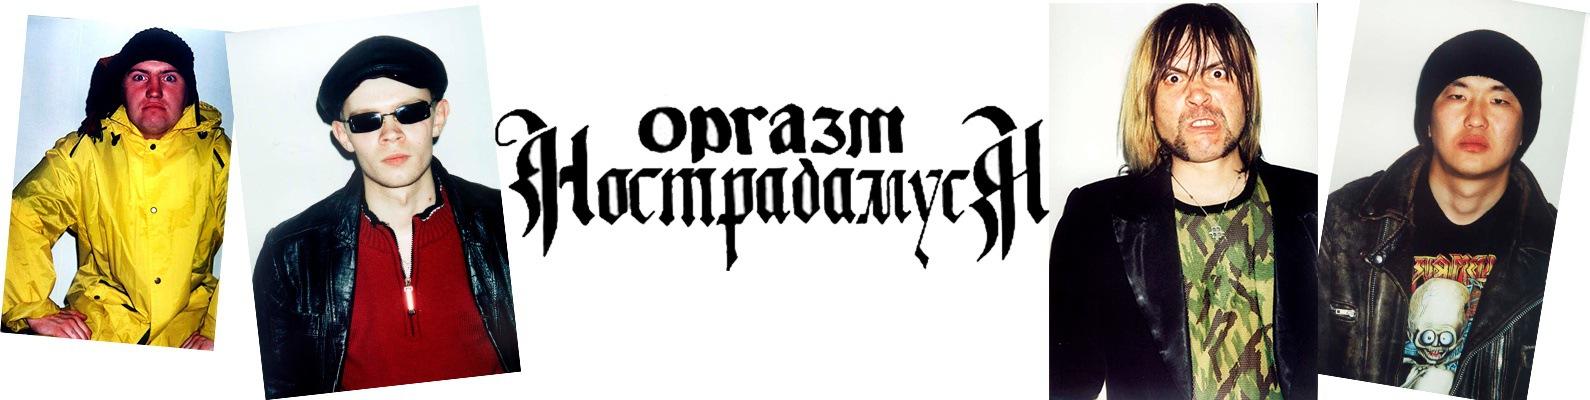 Группа оргазм в контакте